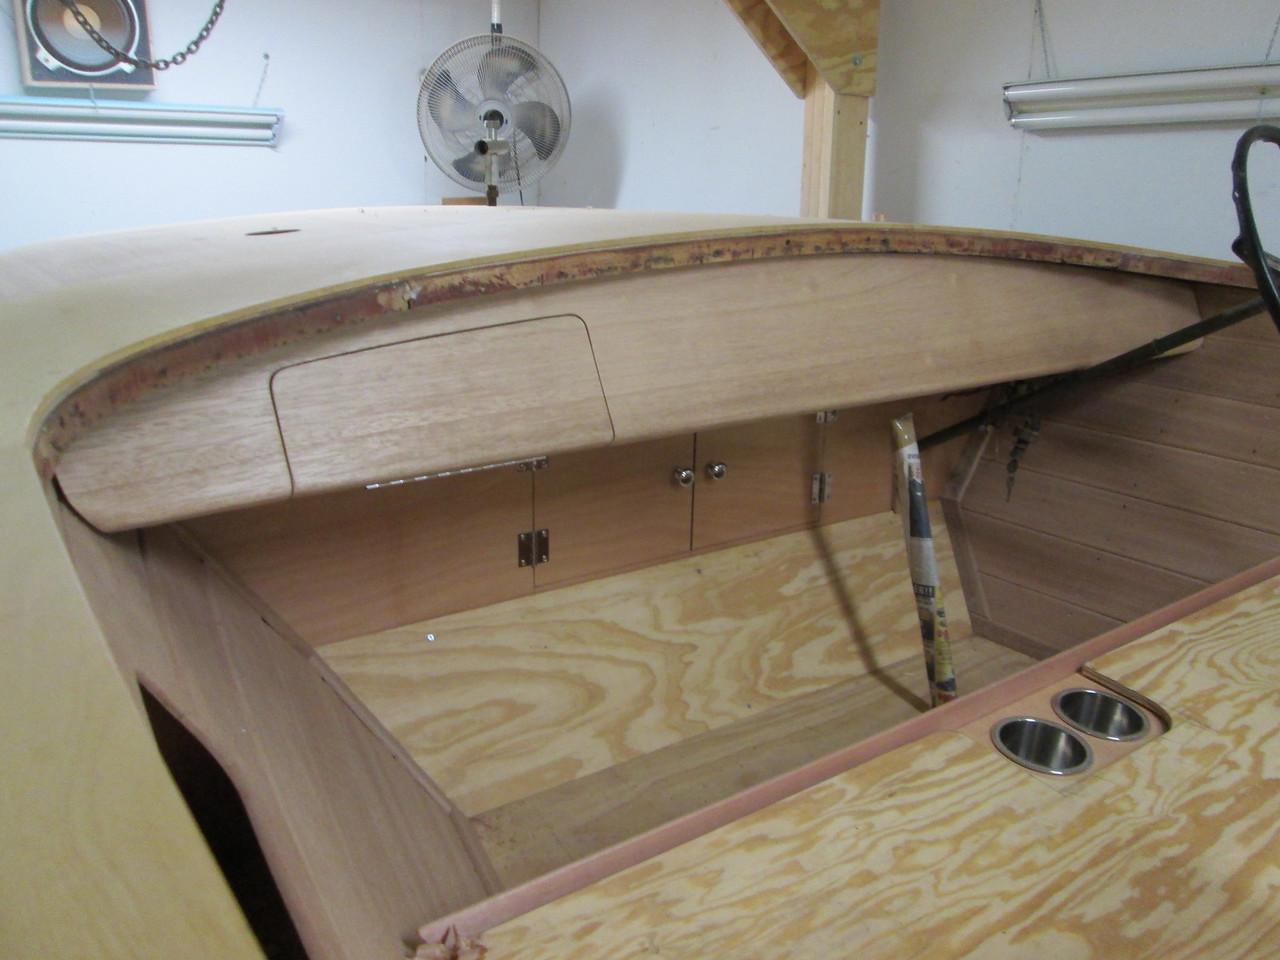 New Mahogany instrument panel with custom glove box closed.